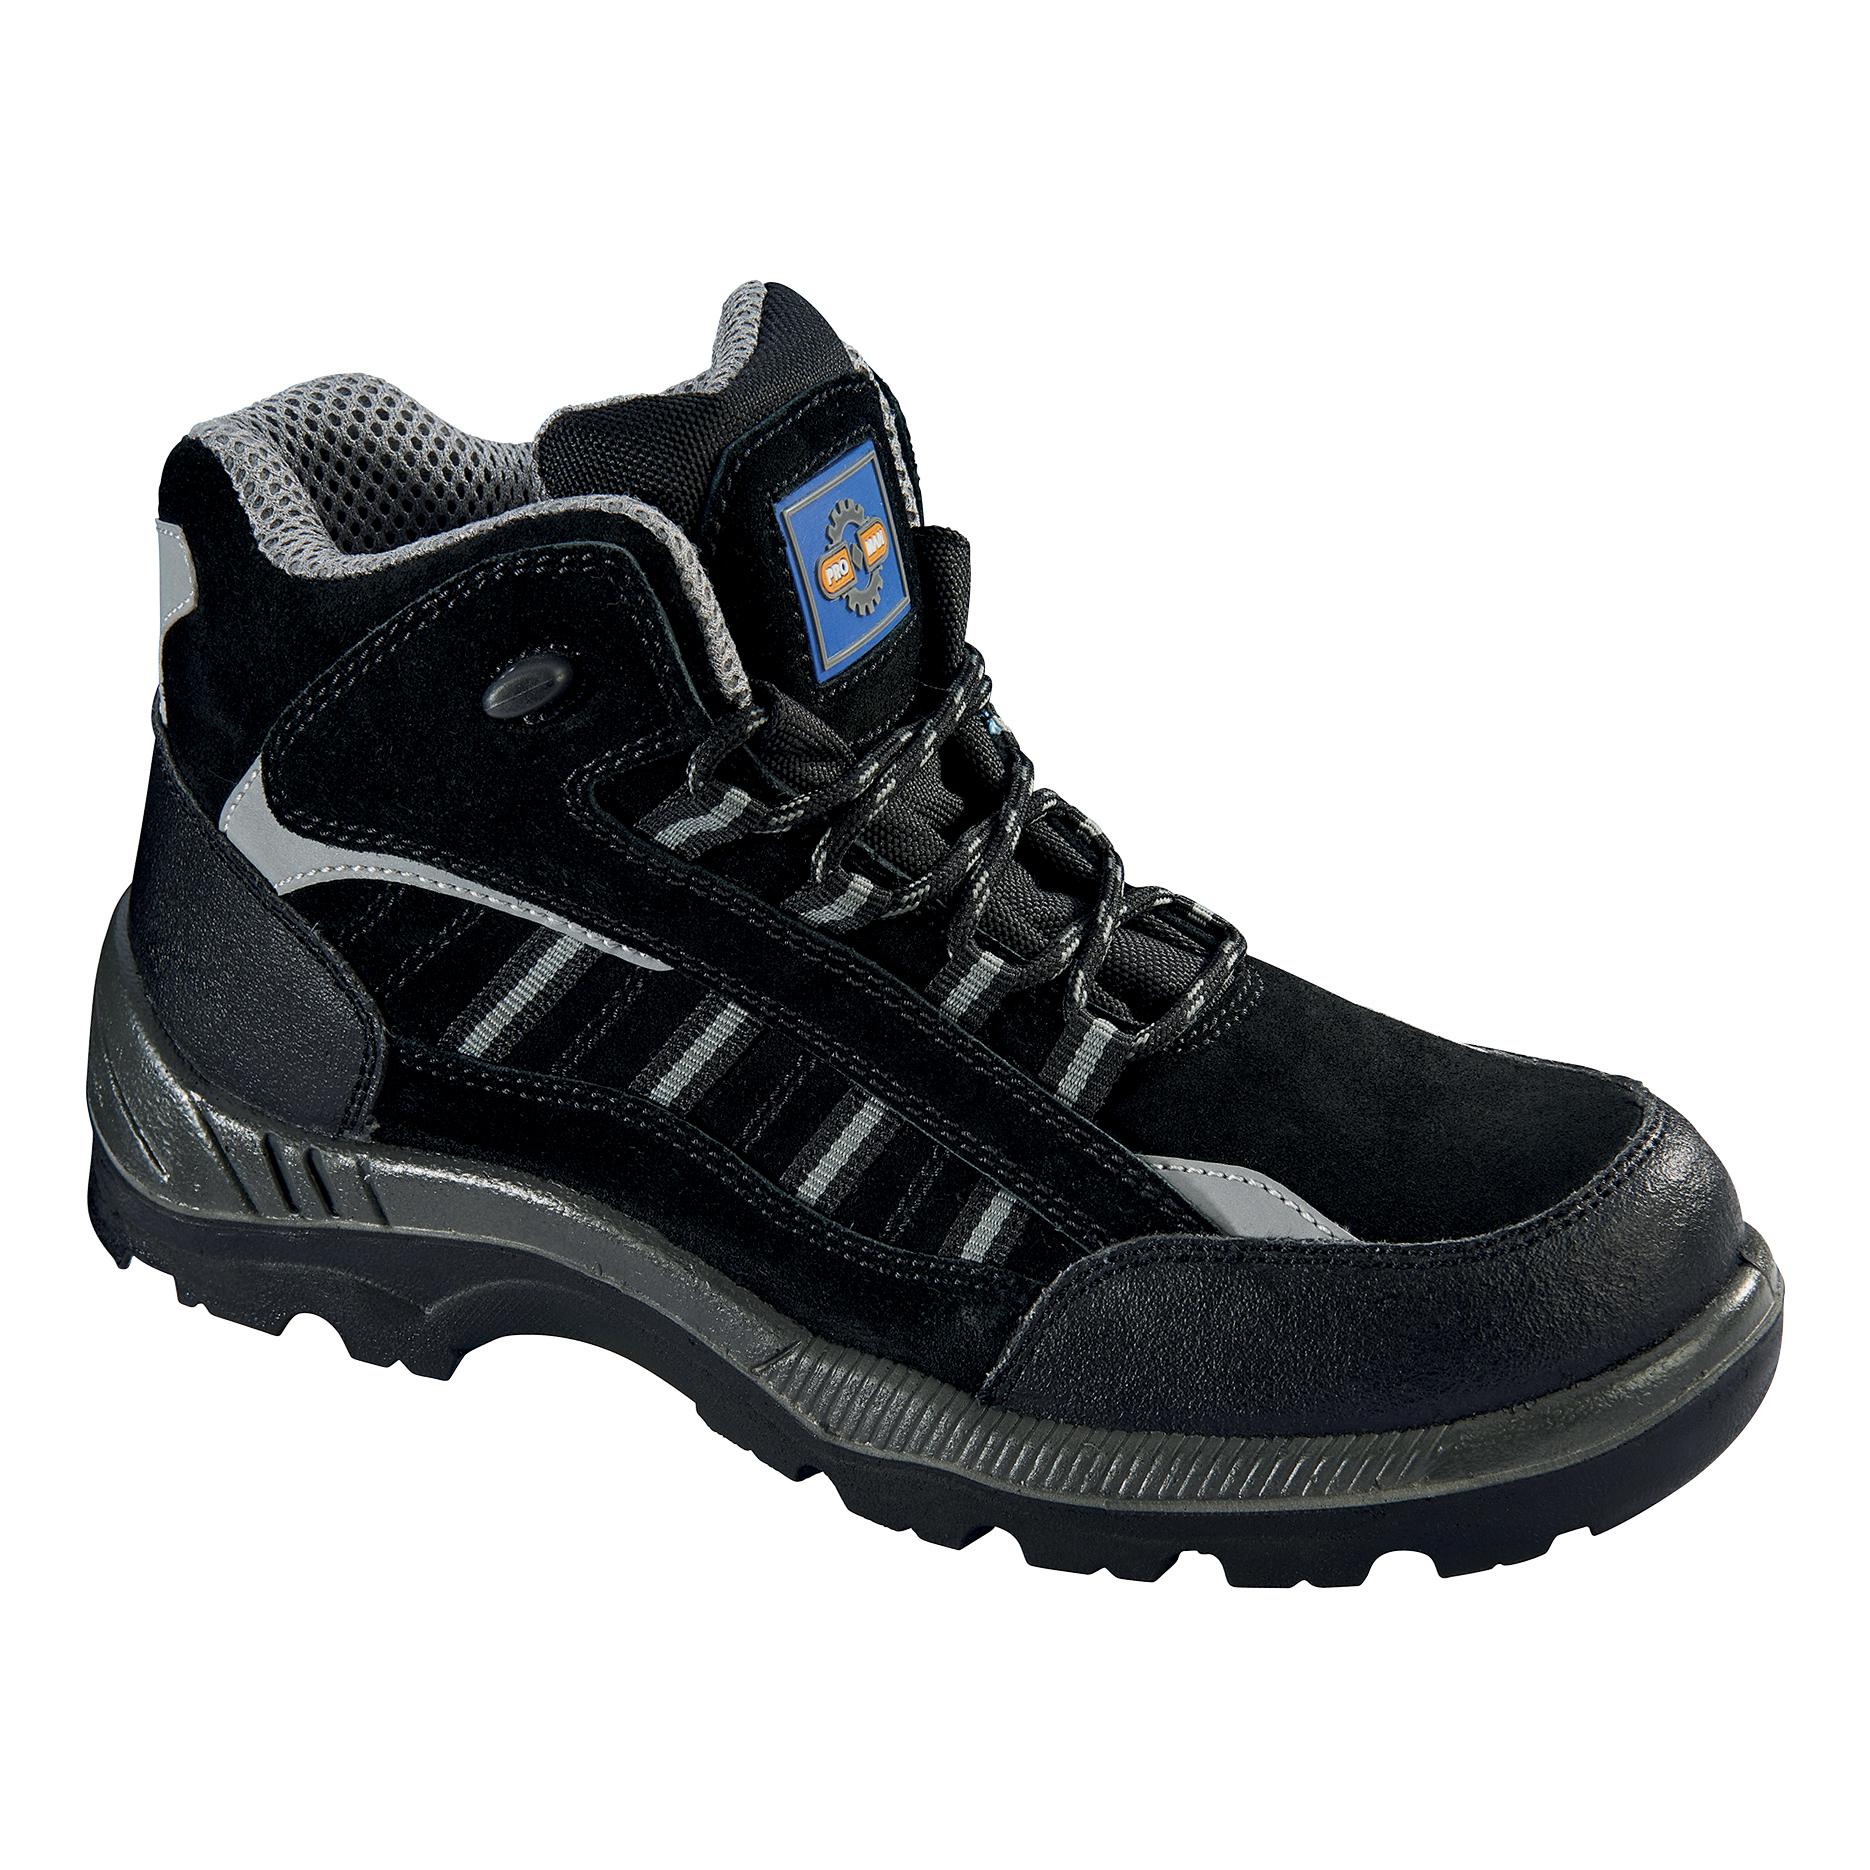 Rockfall ProMan Boot Suede Fibreglass Toecap Black Size 13 Ref PM4020 13